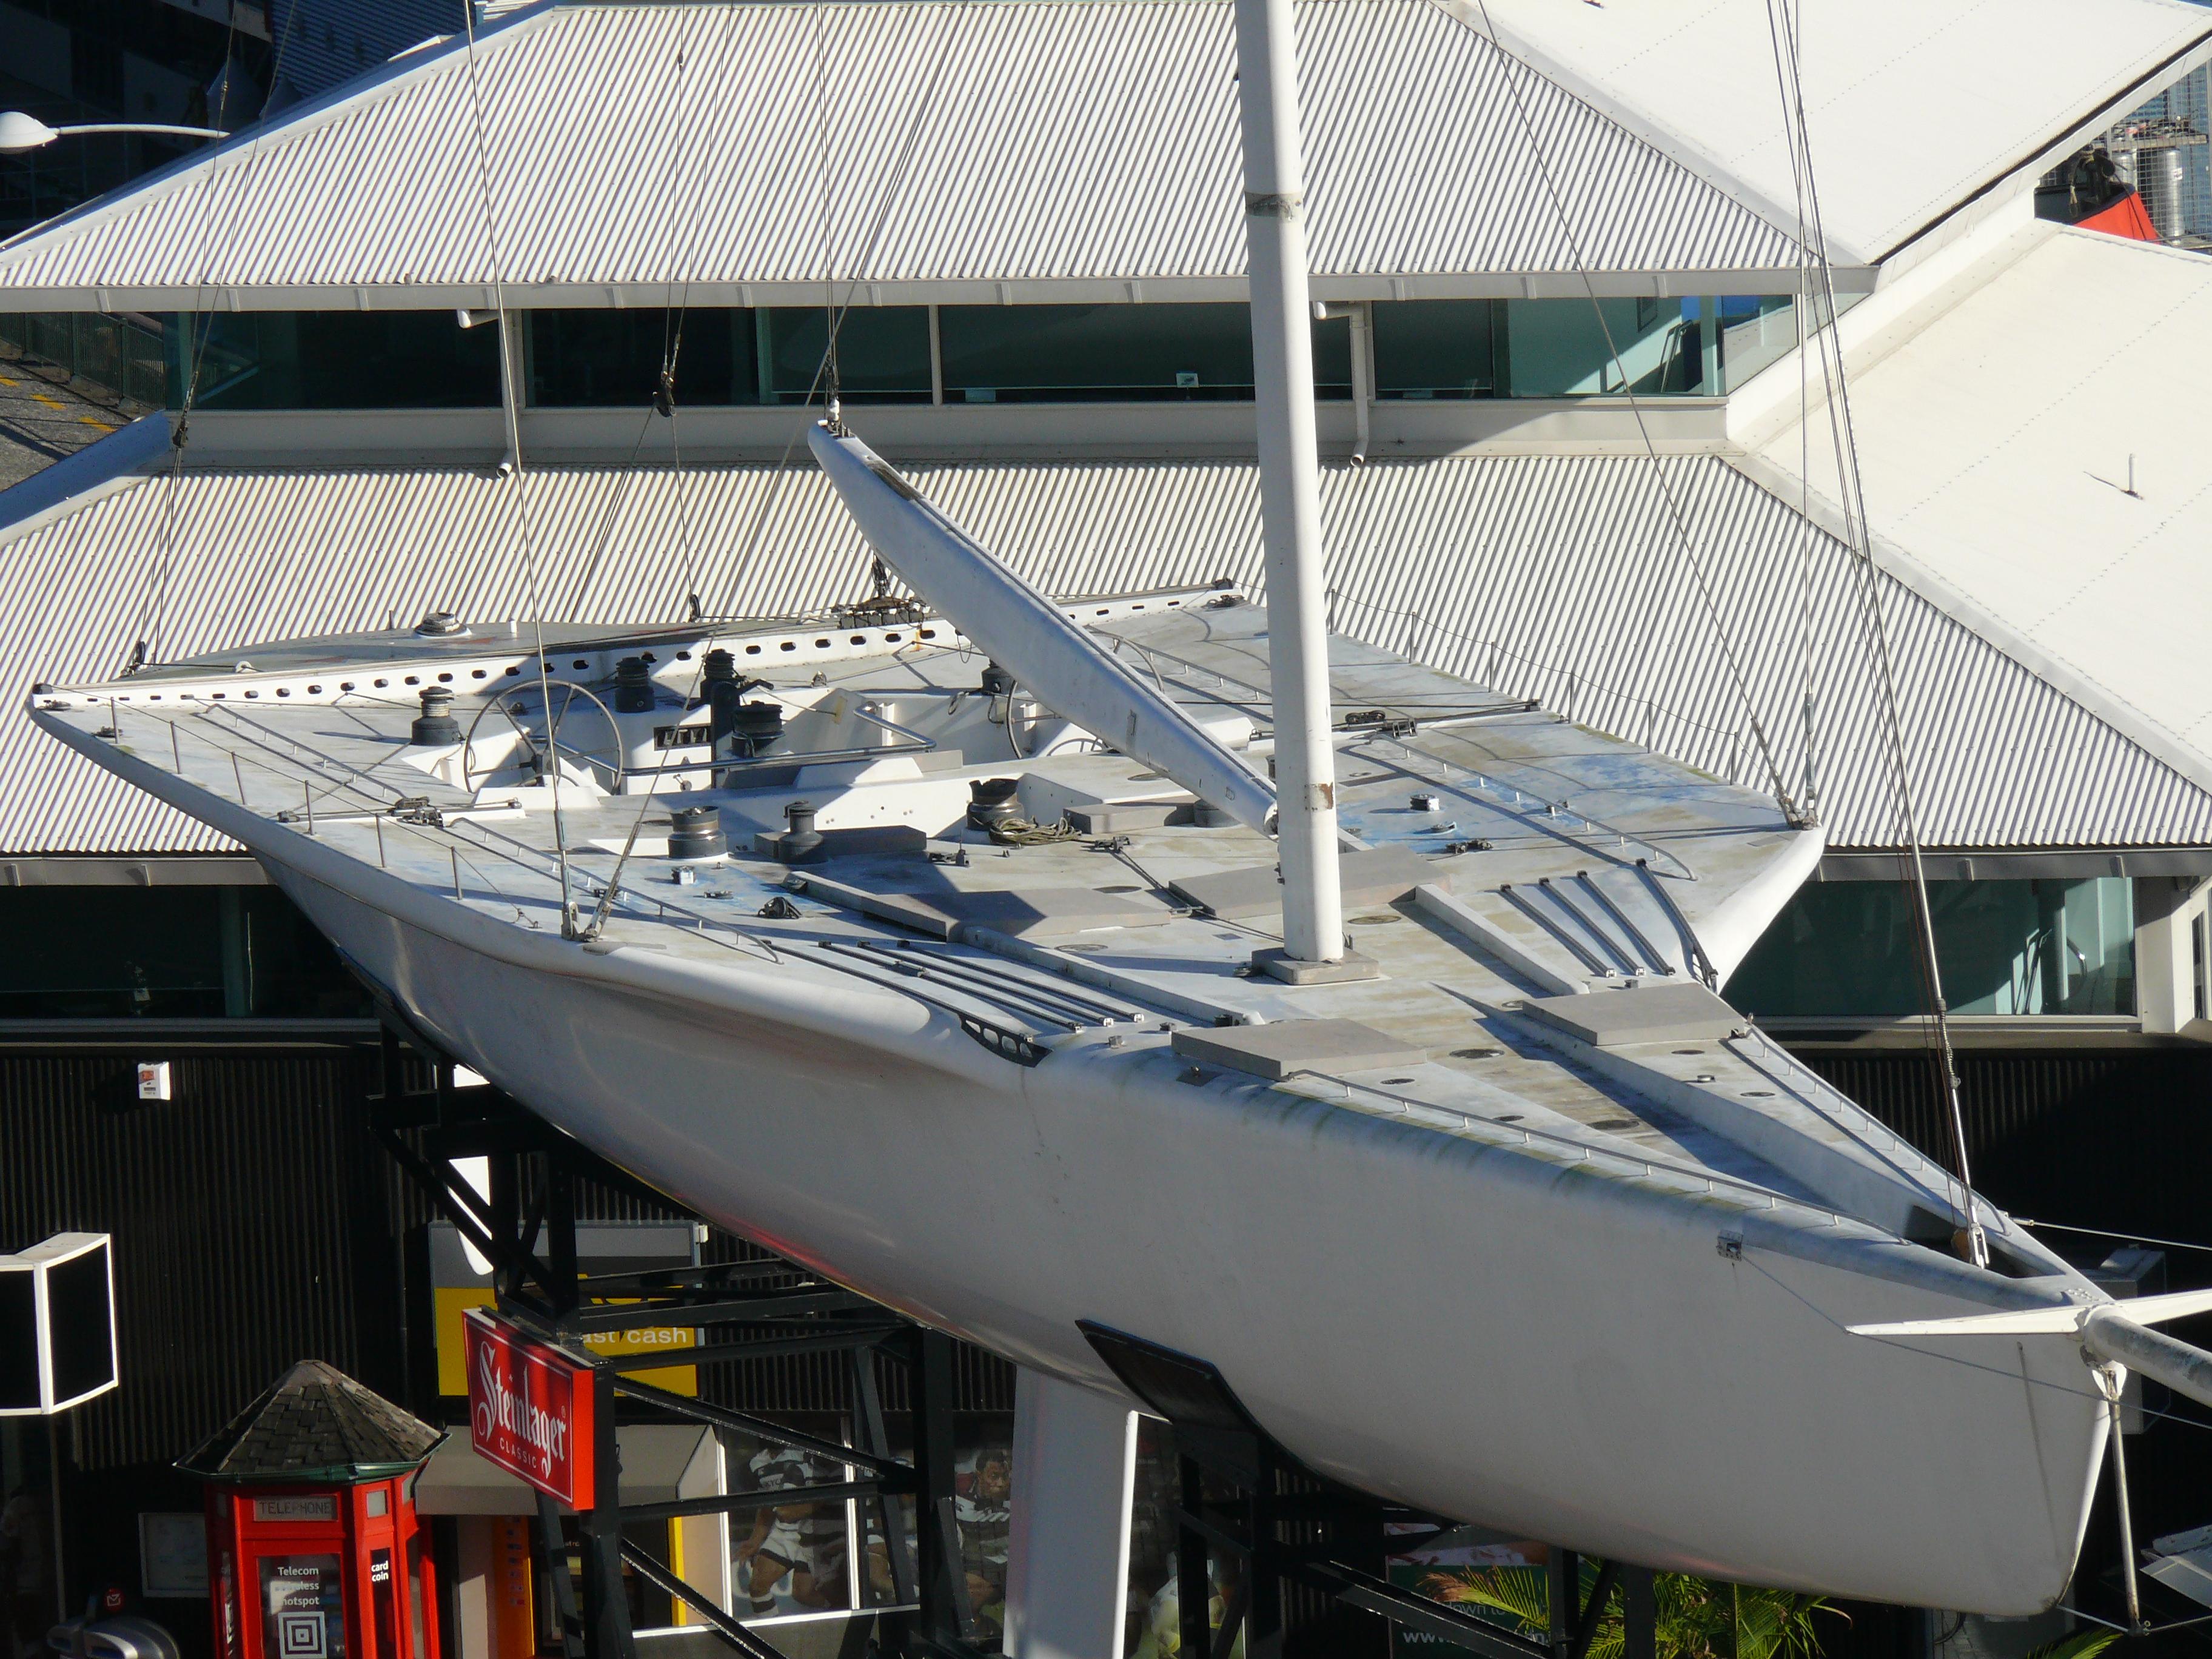 KZ1-yacht_(1).jpg